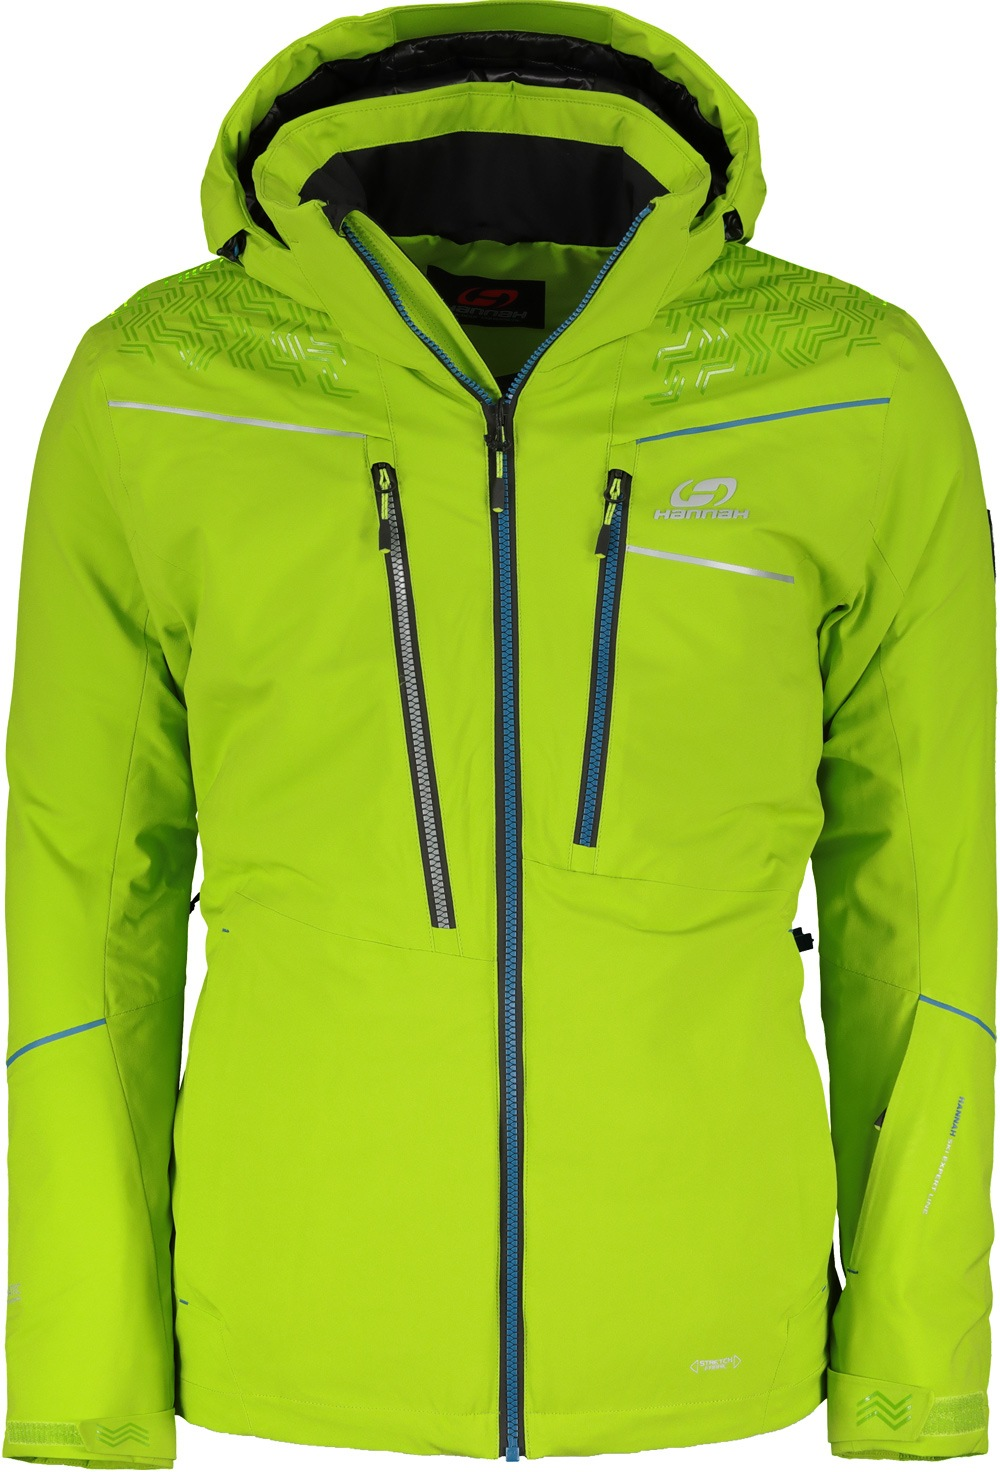 Men´s ski jacket HANNAH Marcos